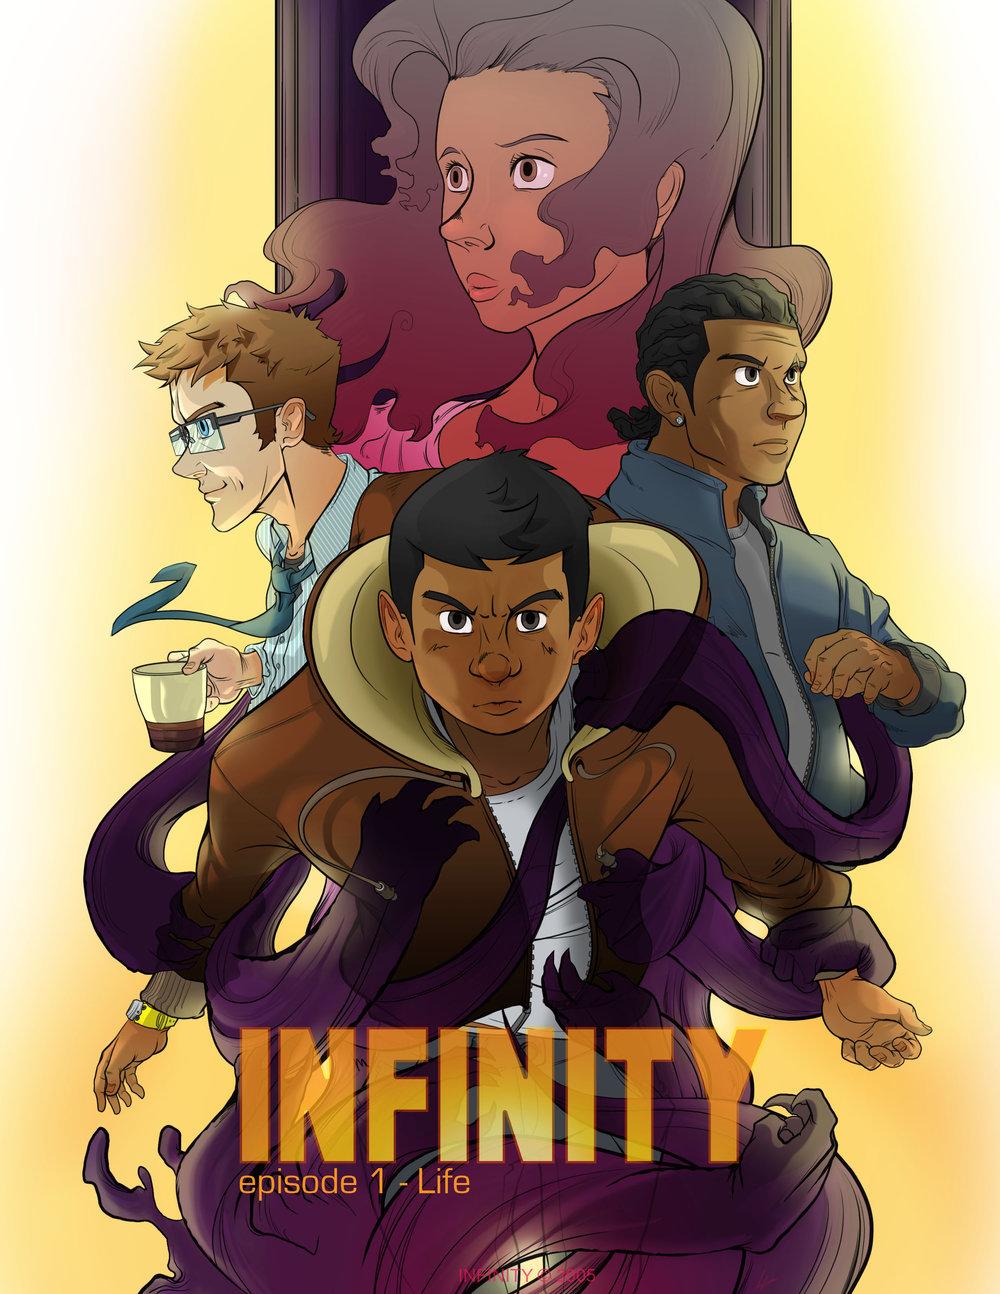 INFINITY - An original comic book series created byLewis Jones.